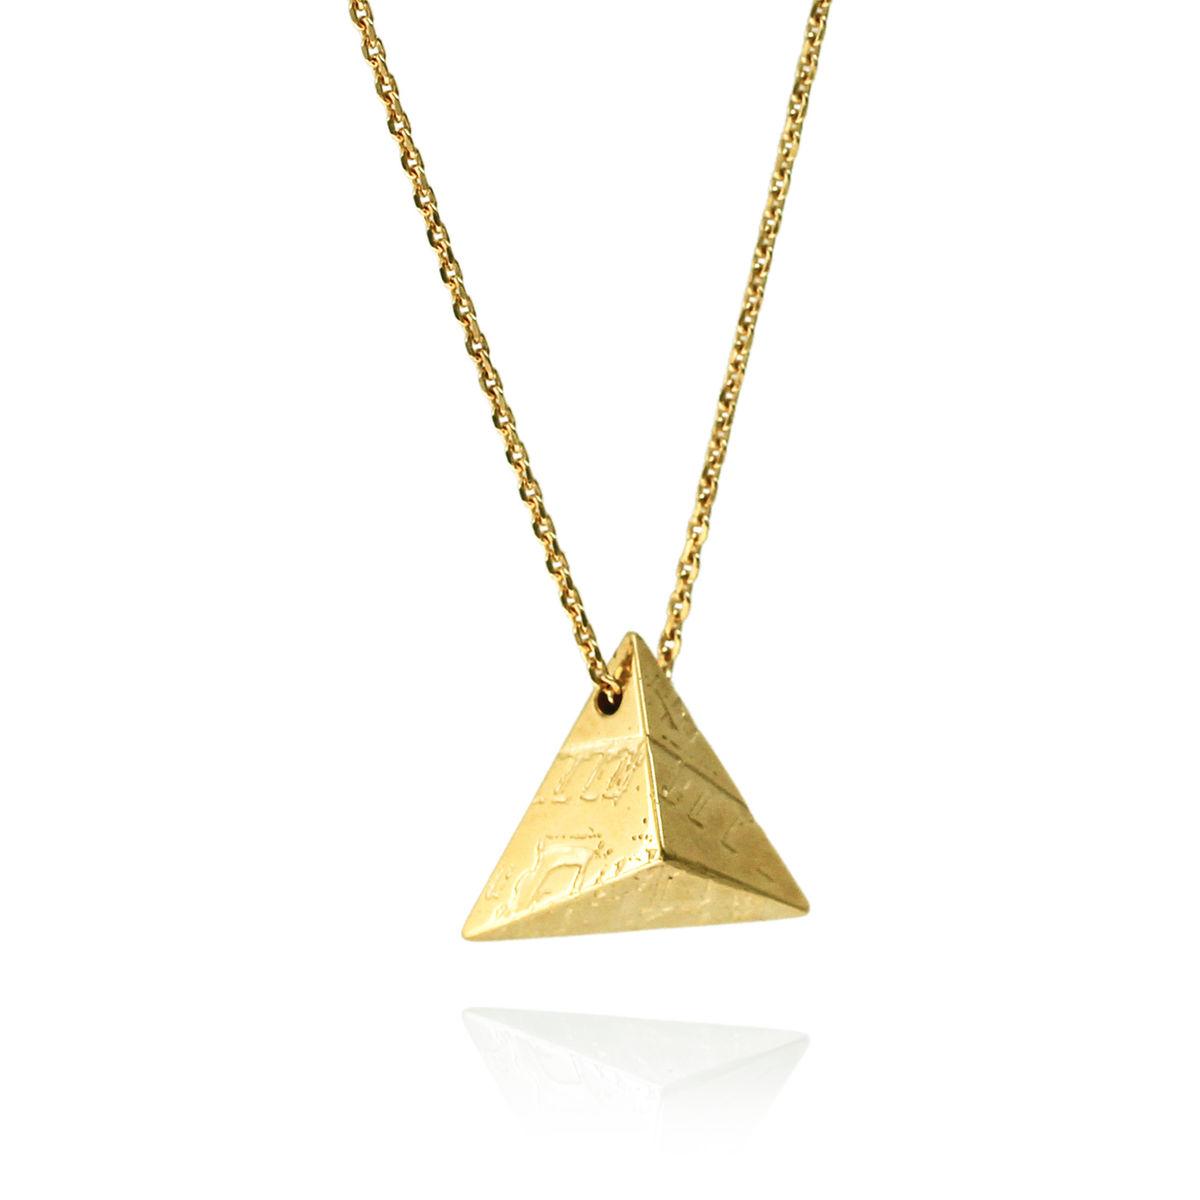 Double sided souvenir pyramid pendant lge gold plated silver double sided souvenir pyramid pendant lge gold plated silver mozeypictures Images